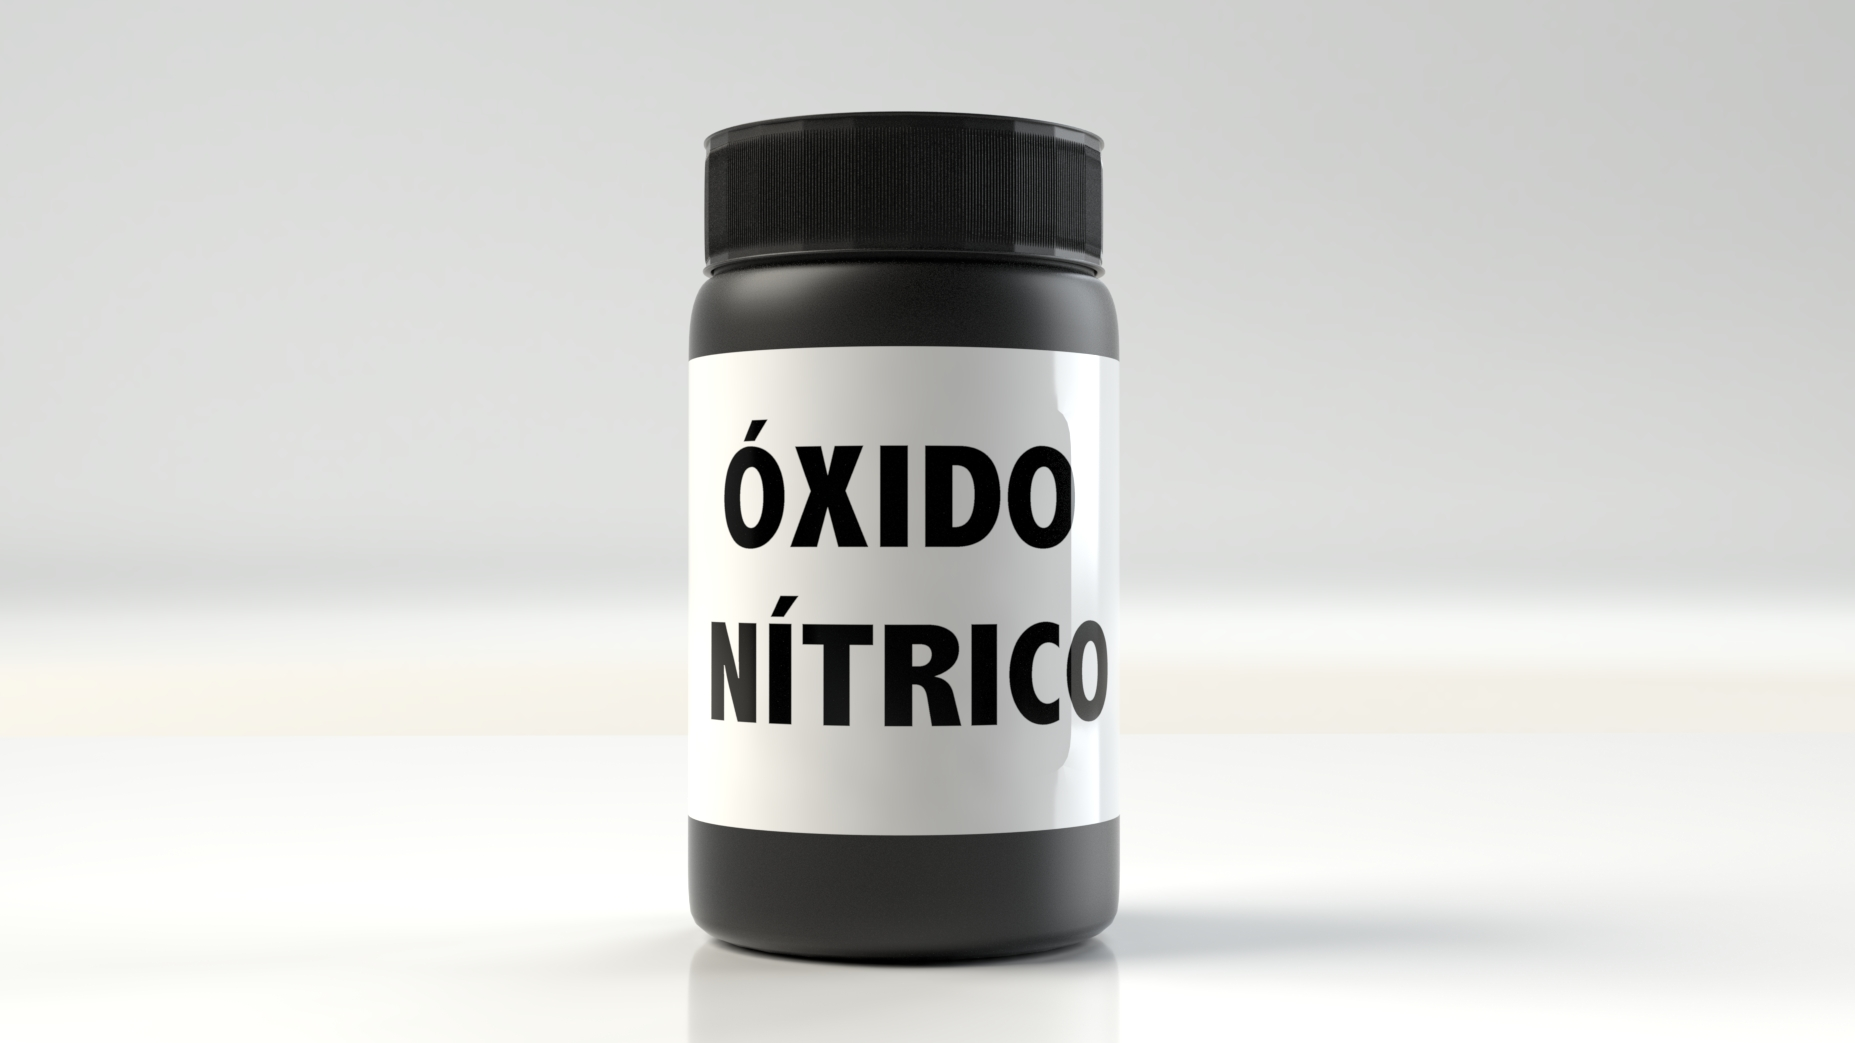 Oxido nitrico suplemento deportivo